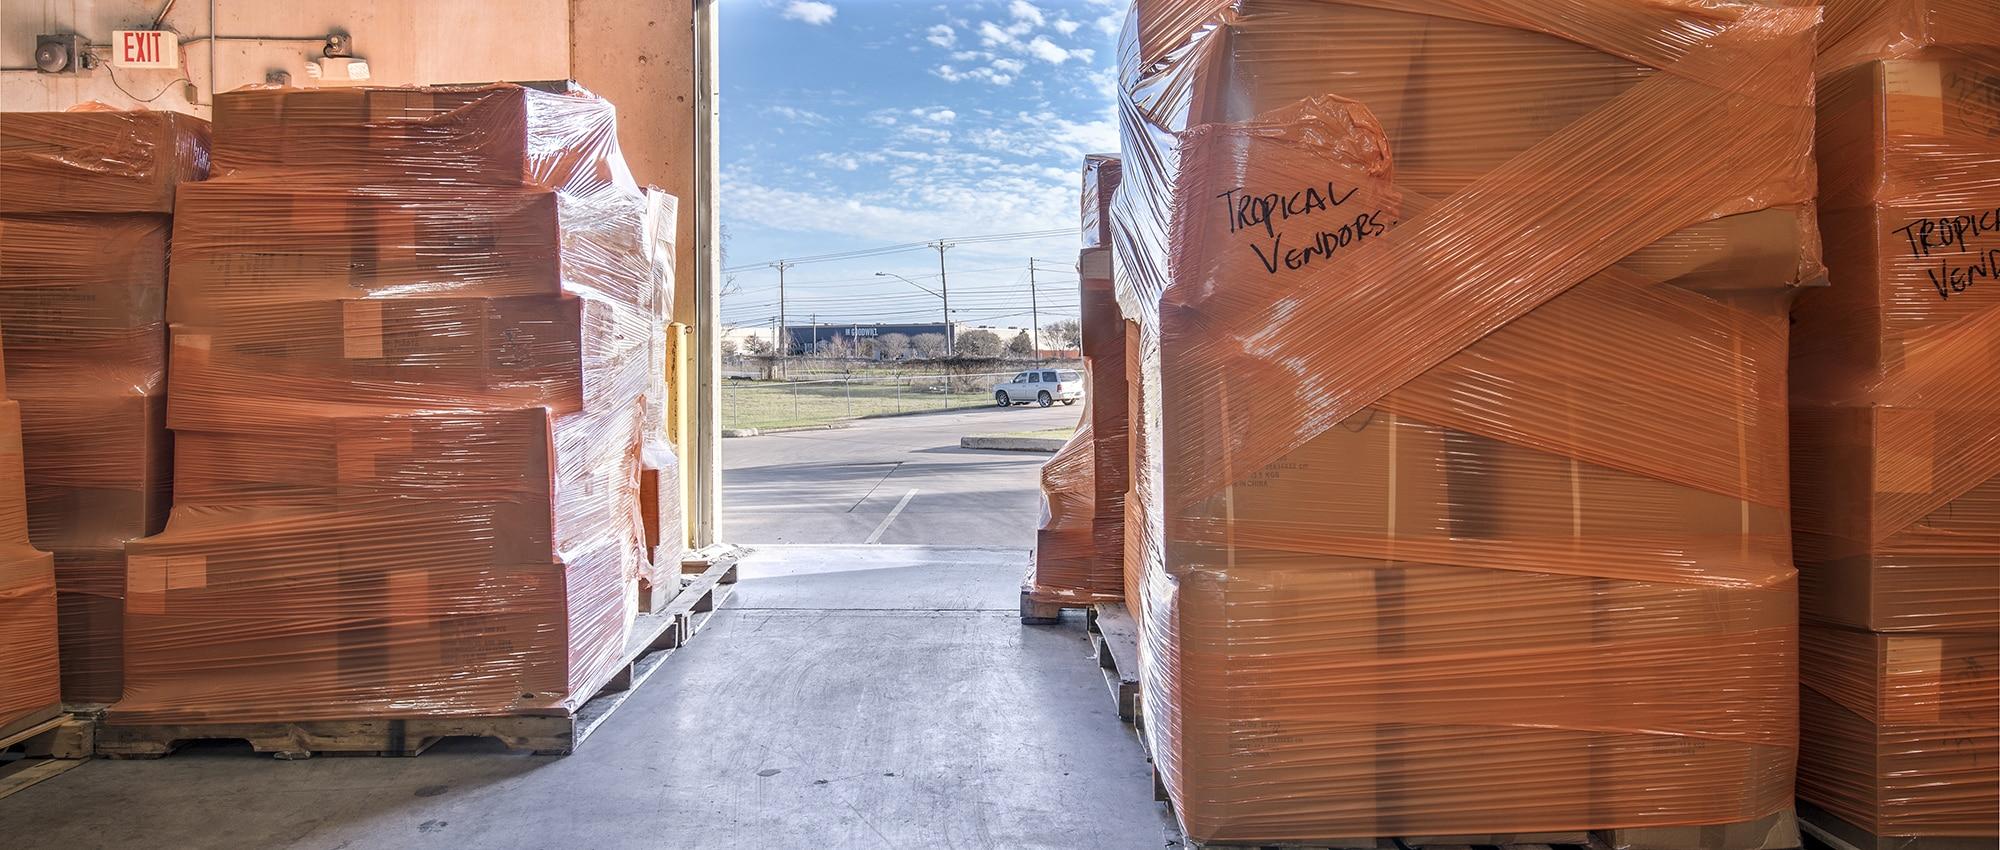 GetaGadget Interior Warehouse Space in Austin, Texas